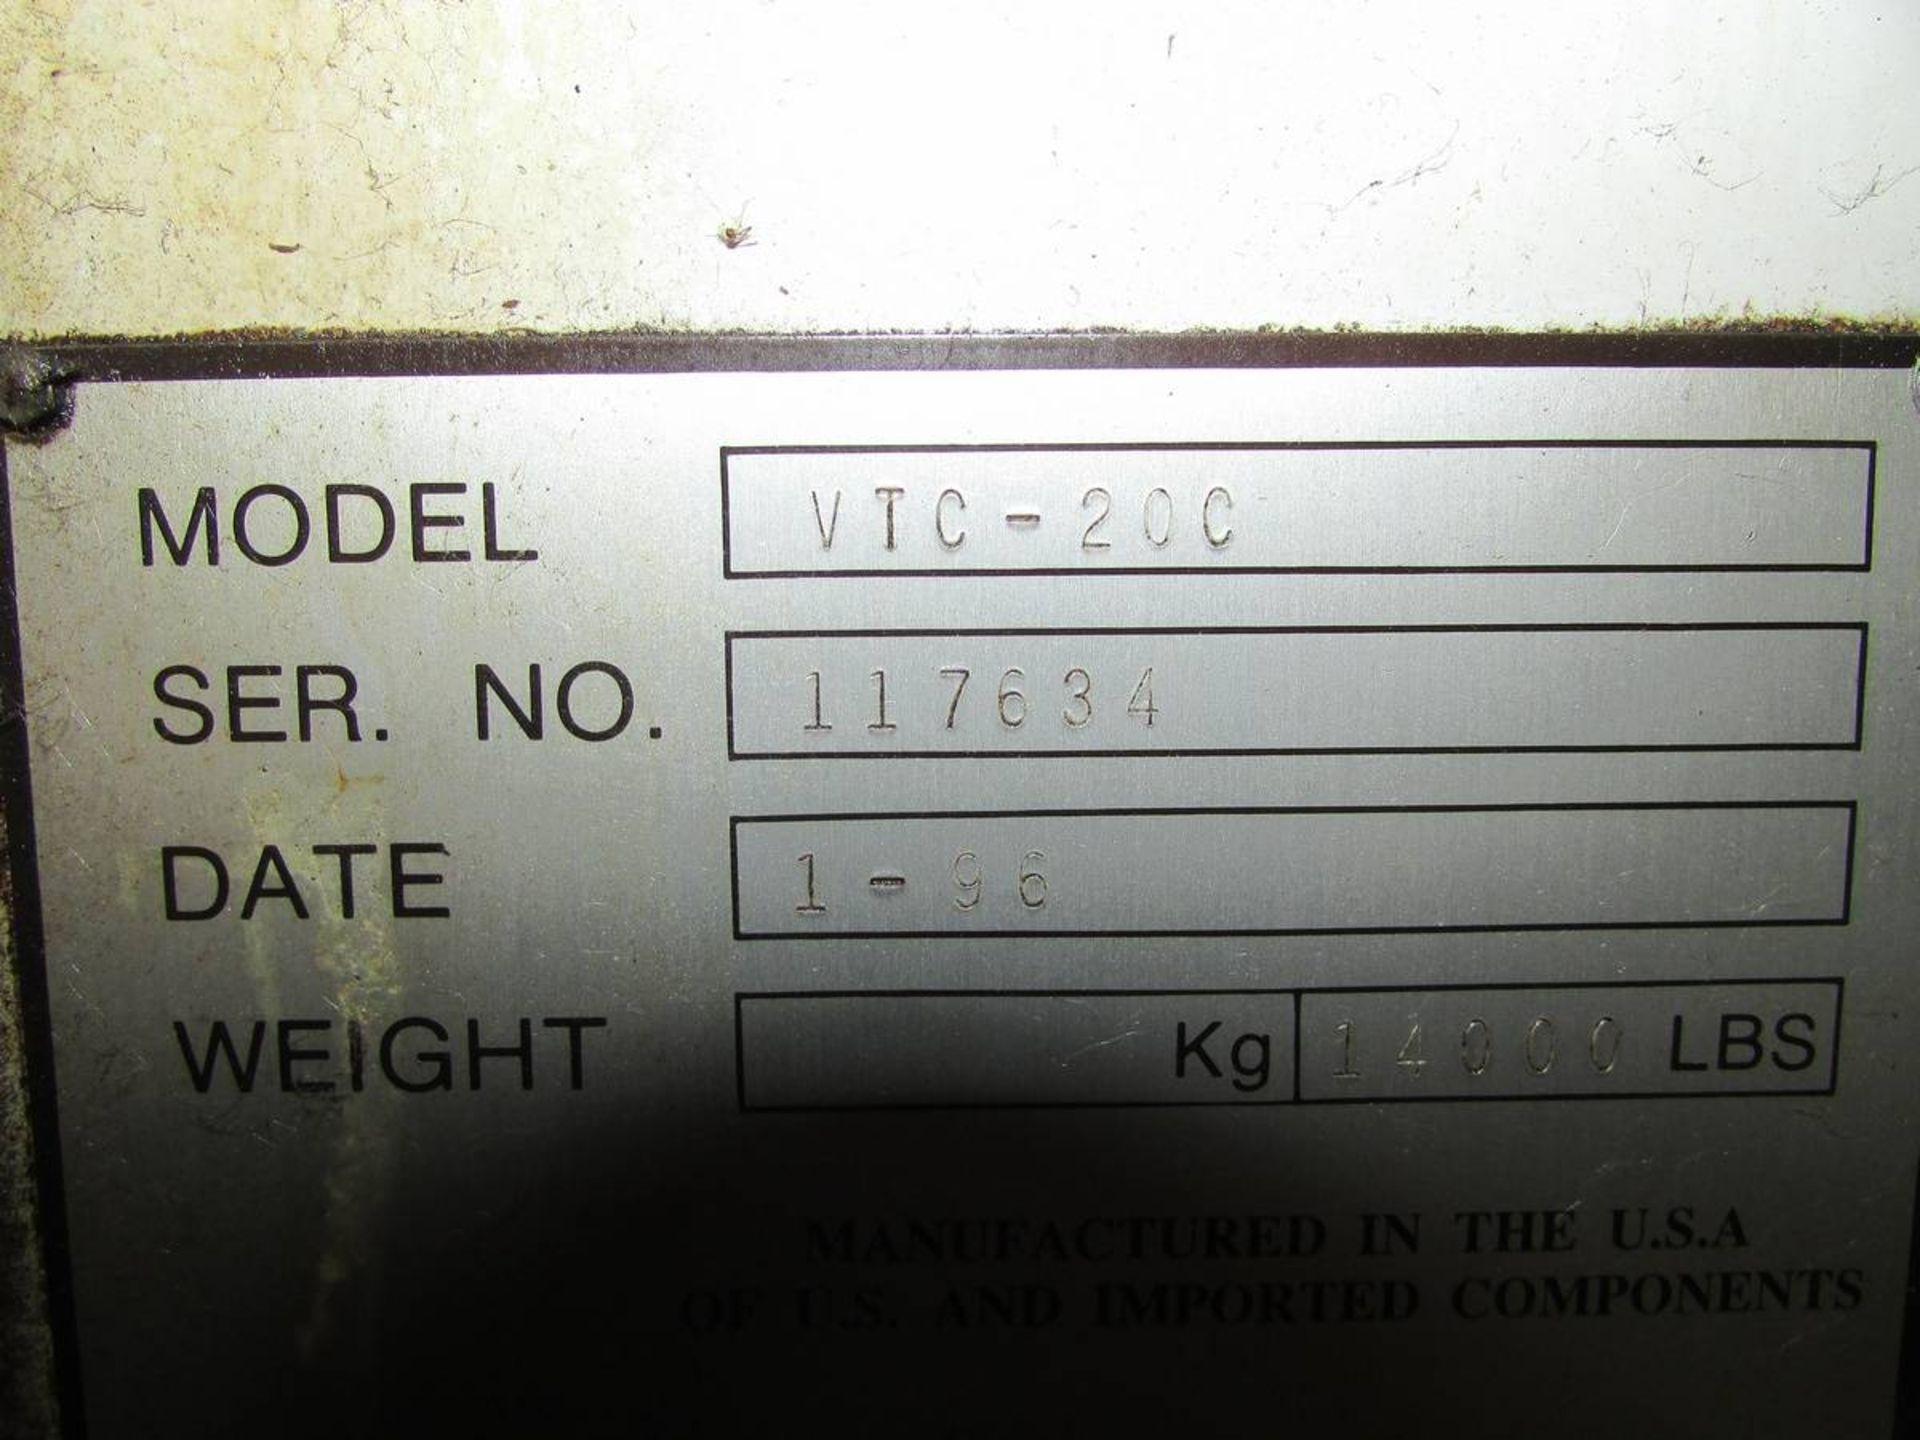 1996 Mazak VTC-20C Vertical Traveling Column 3-Axis CNC Machining Center - Image 19 of 20